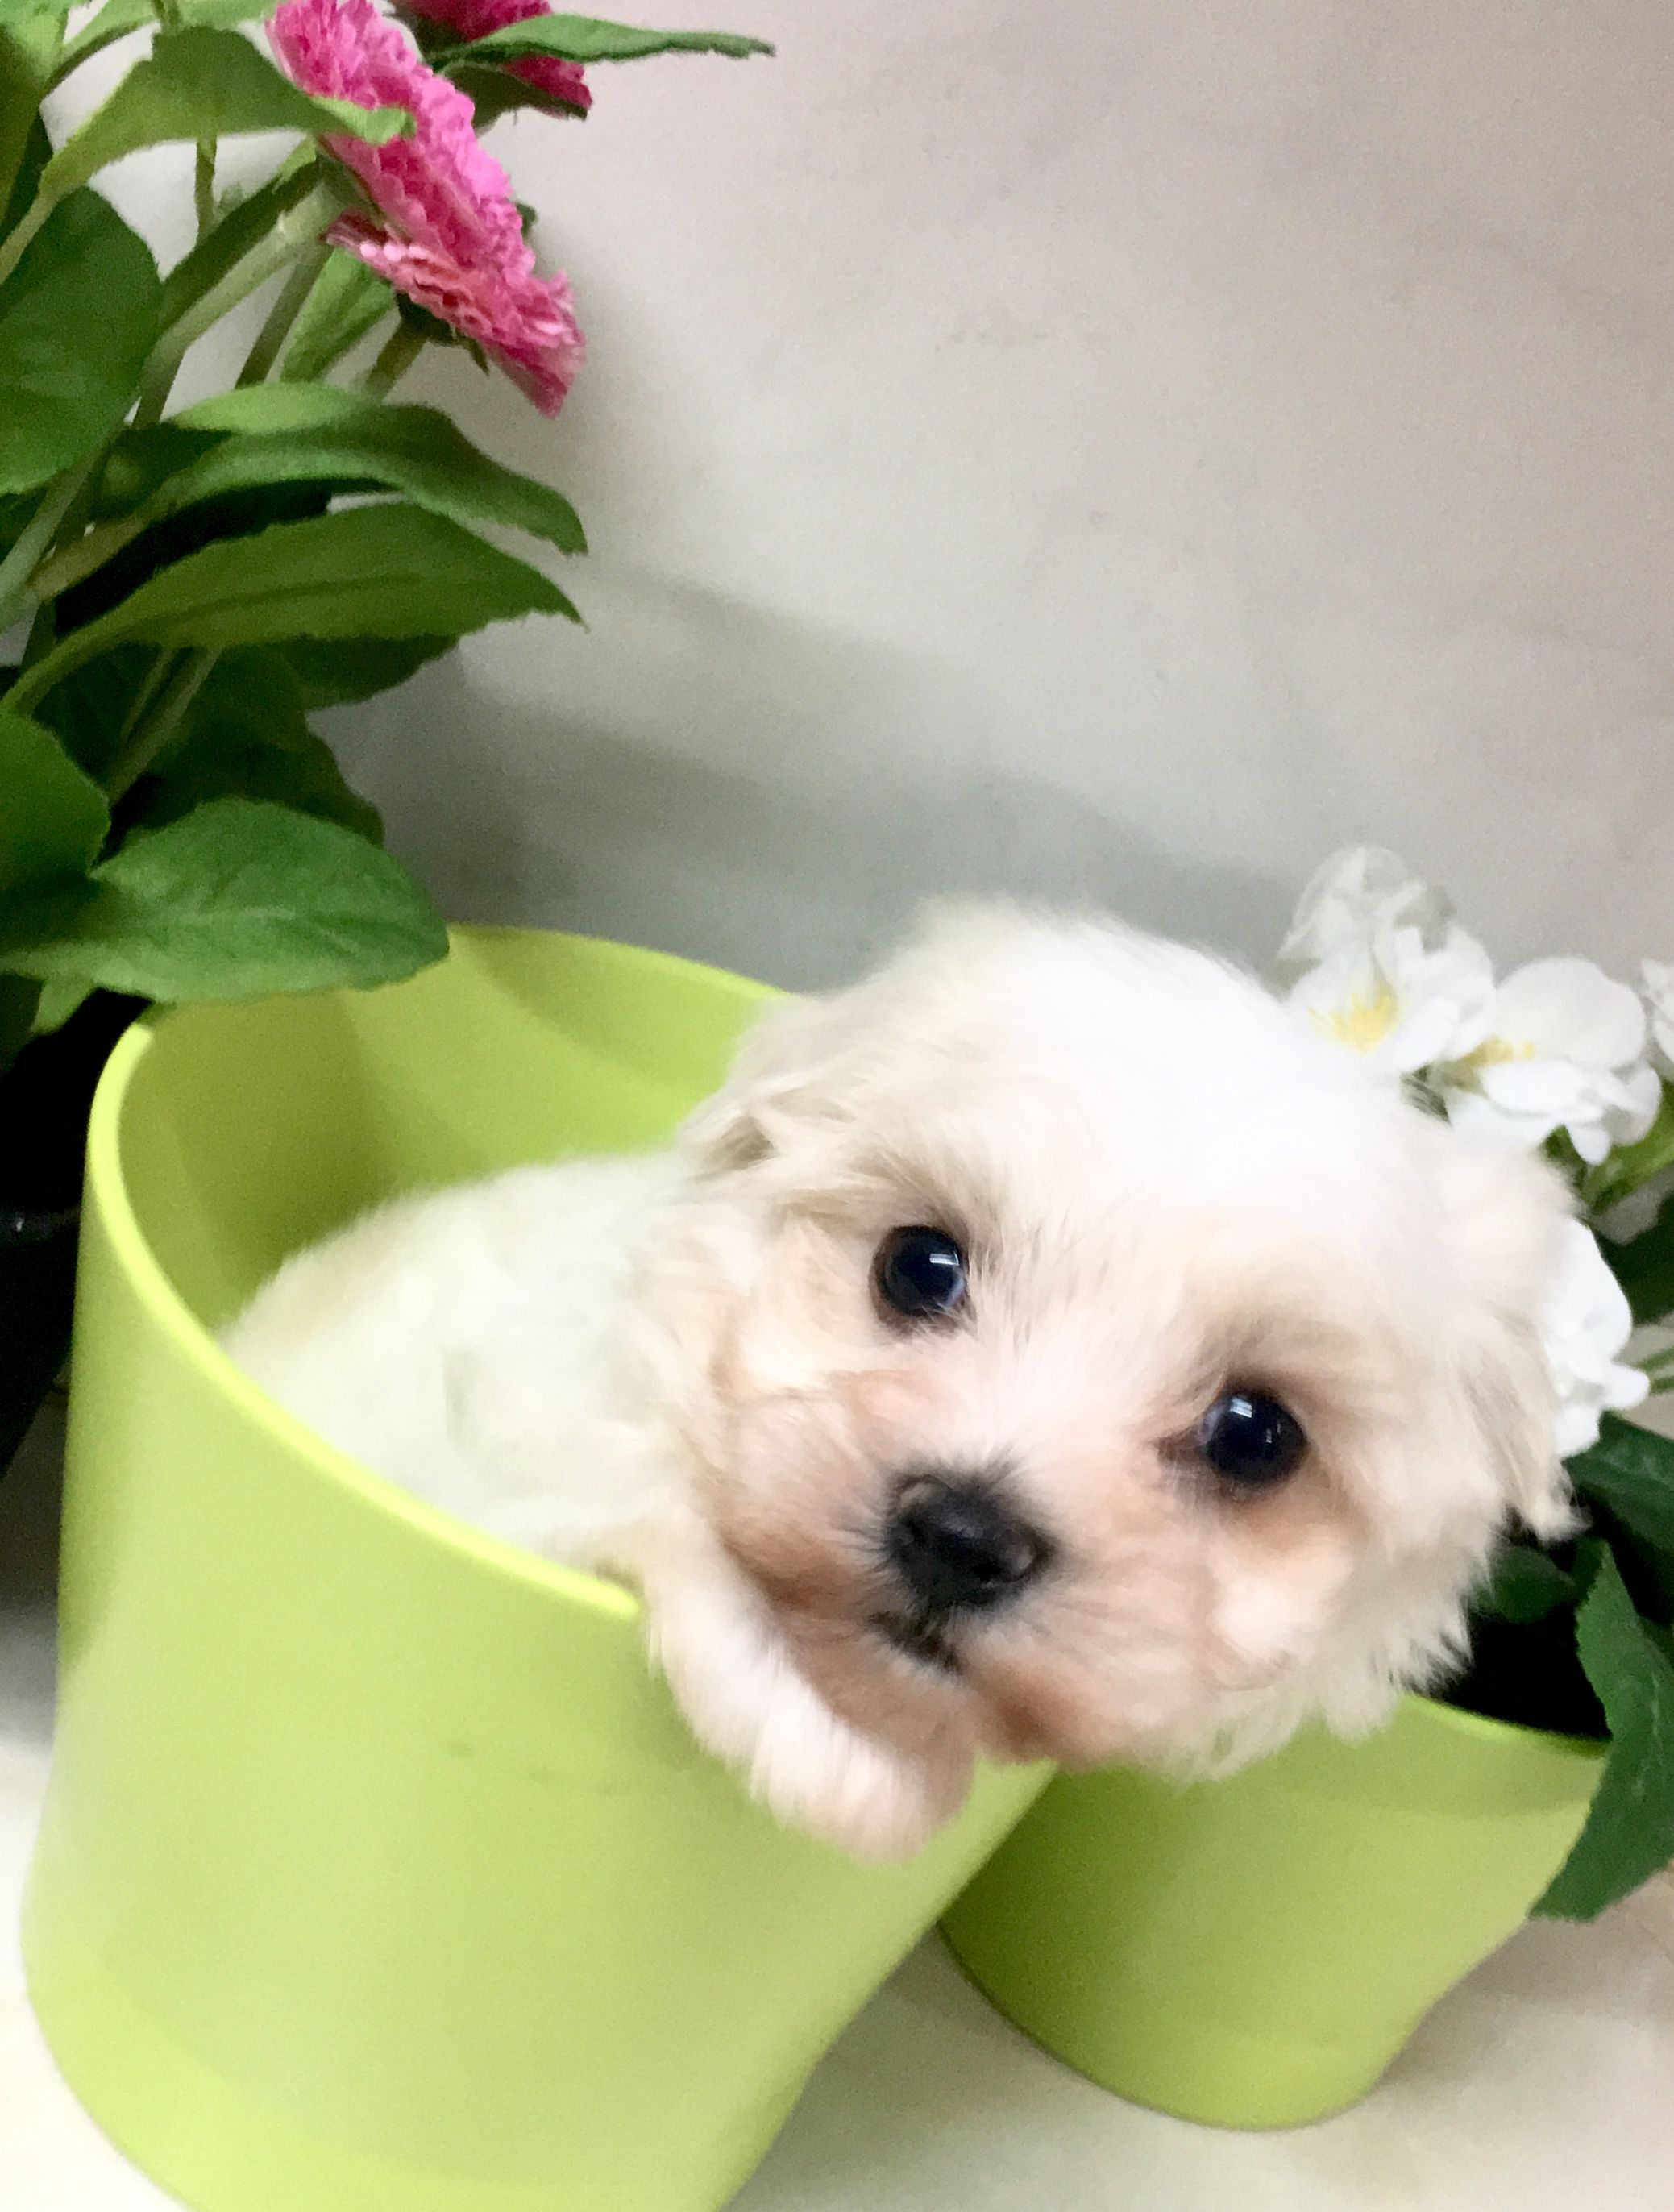 Maltes De Www Criaderoarai Es Cachorros Criadero Maltes Bichon Bichon Maltes Maltesedoggy Maltesedoggies Maltese Cute Animals Animals Animals And Pets